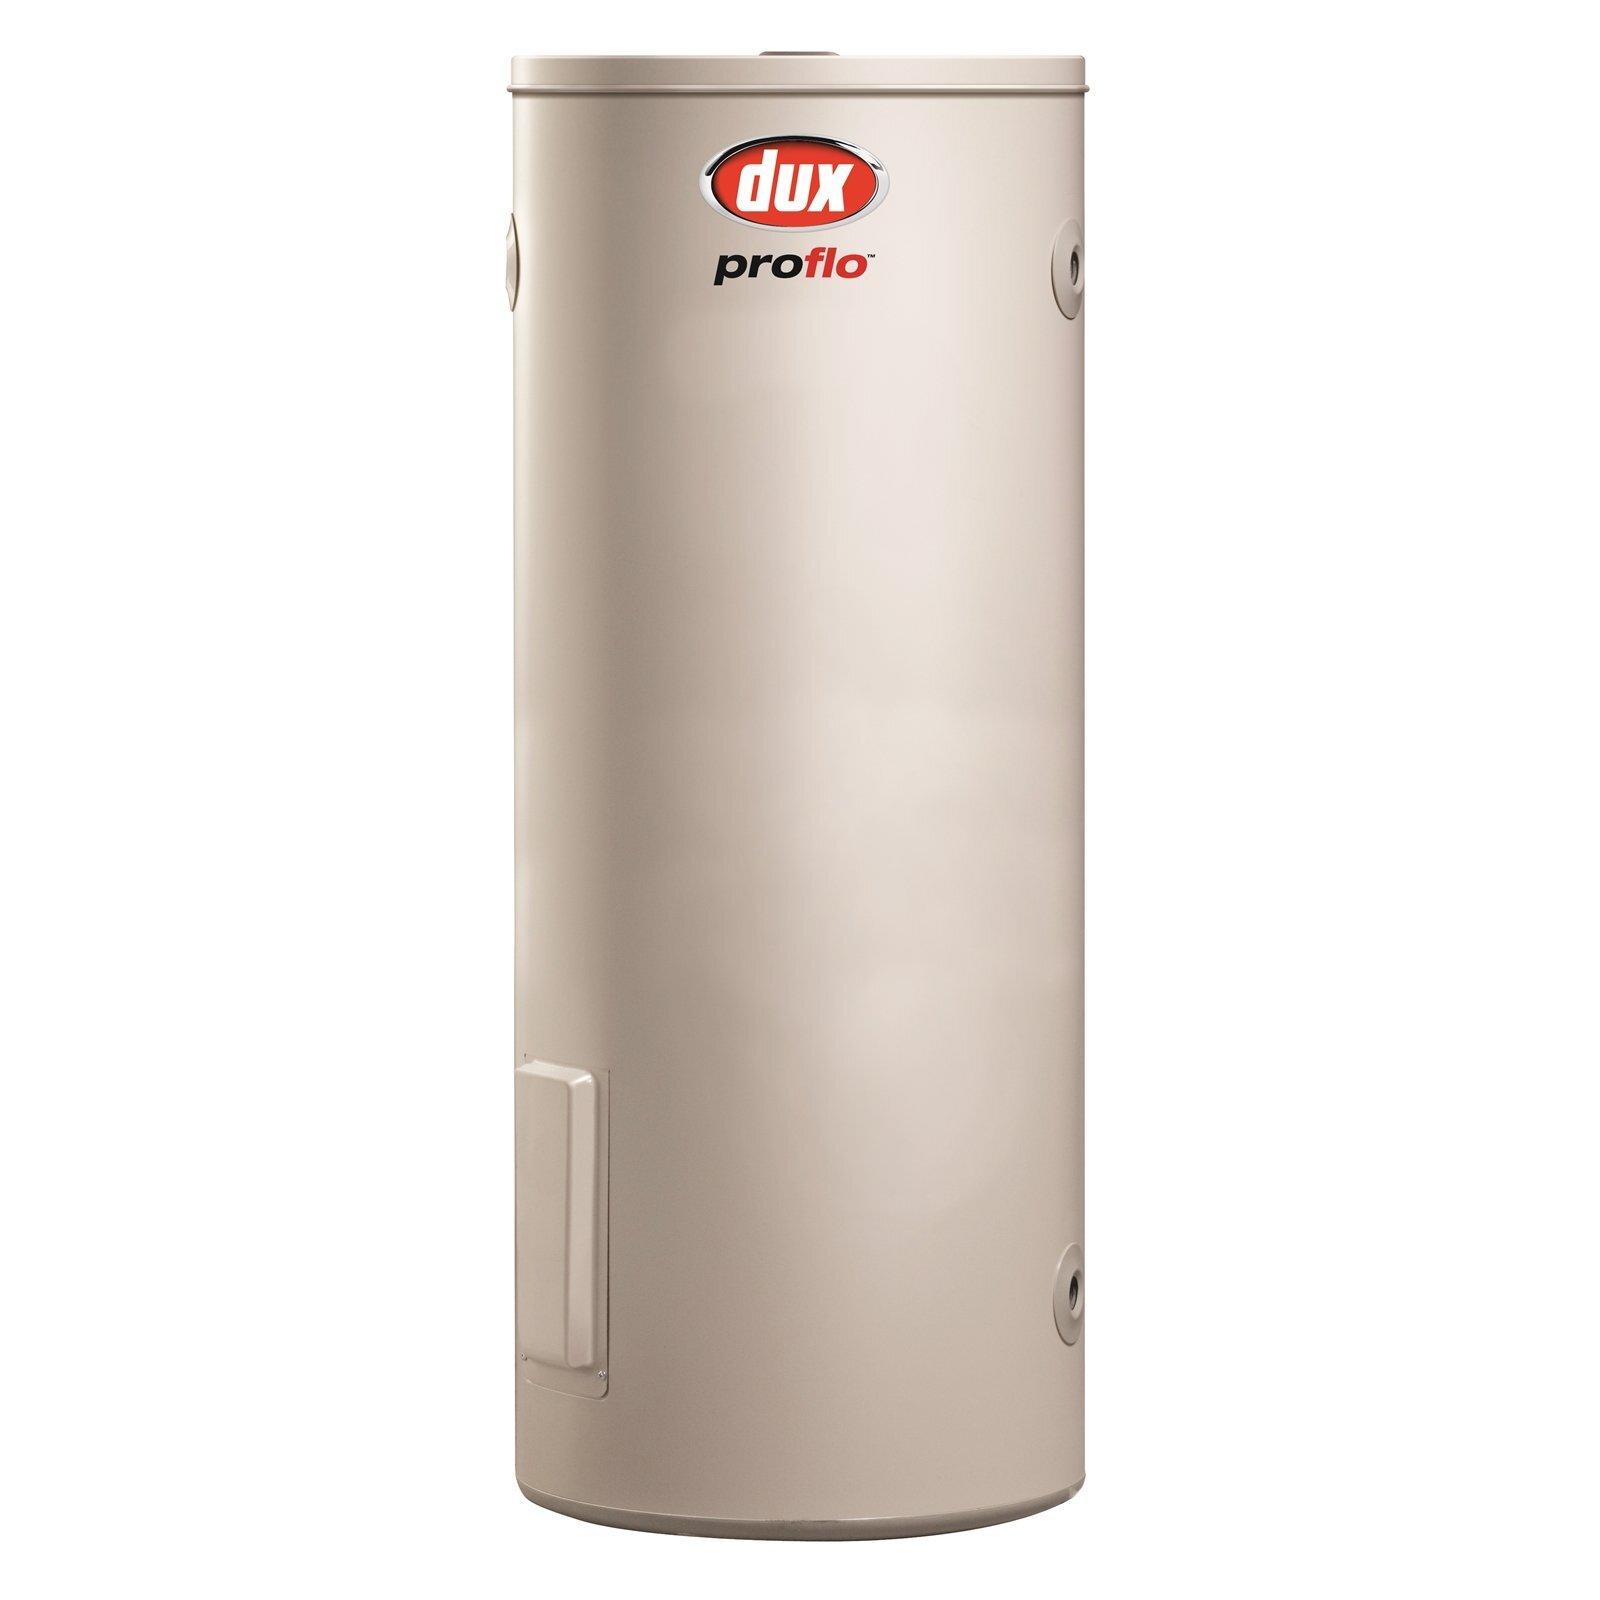 Dux 400L 3.6kW Proflo Electric Storage Water Heater